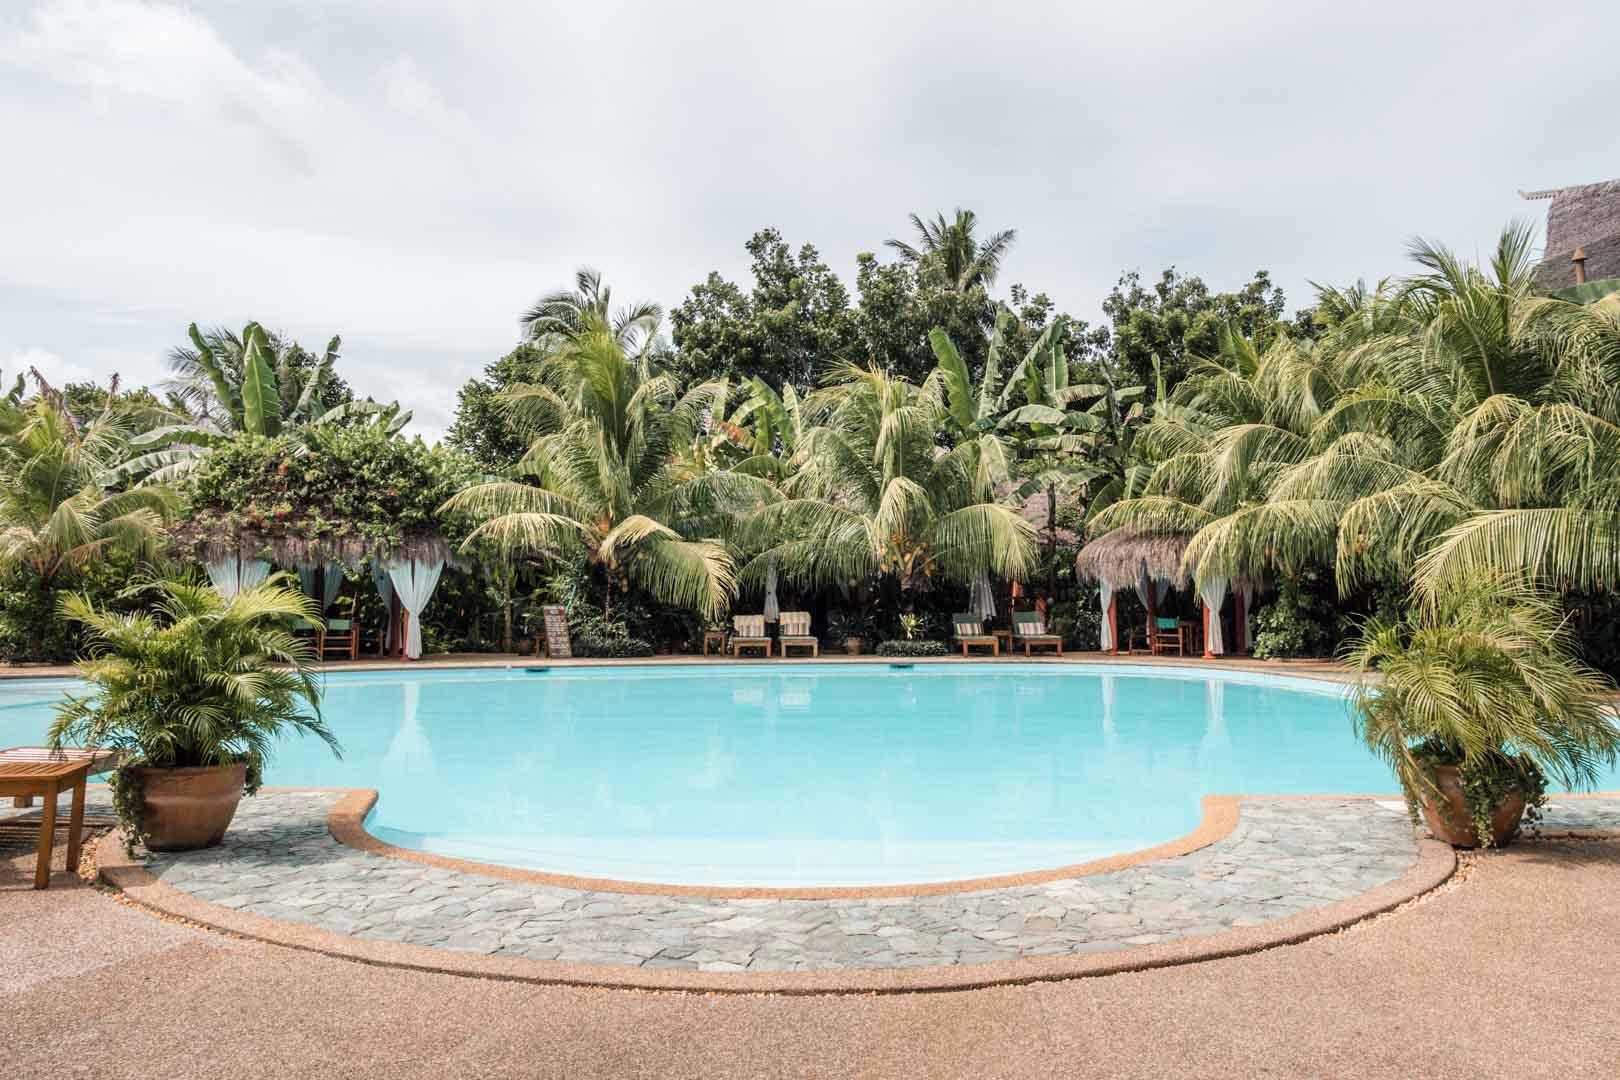 Coco Grove swimming pool